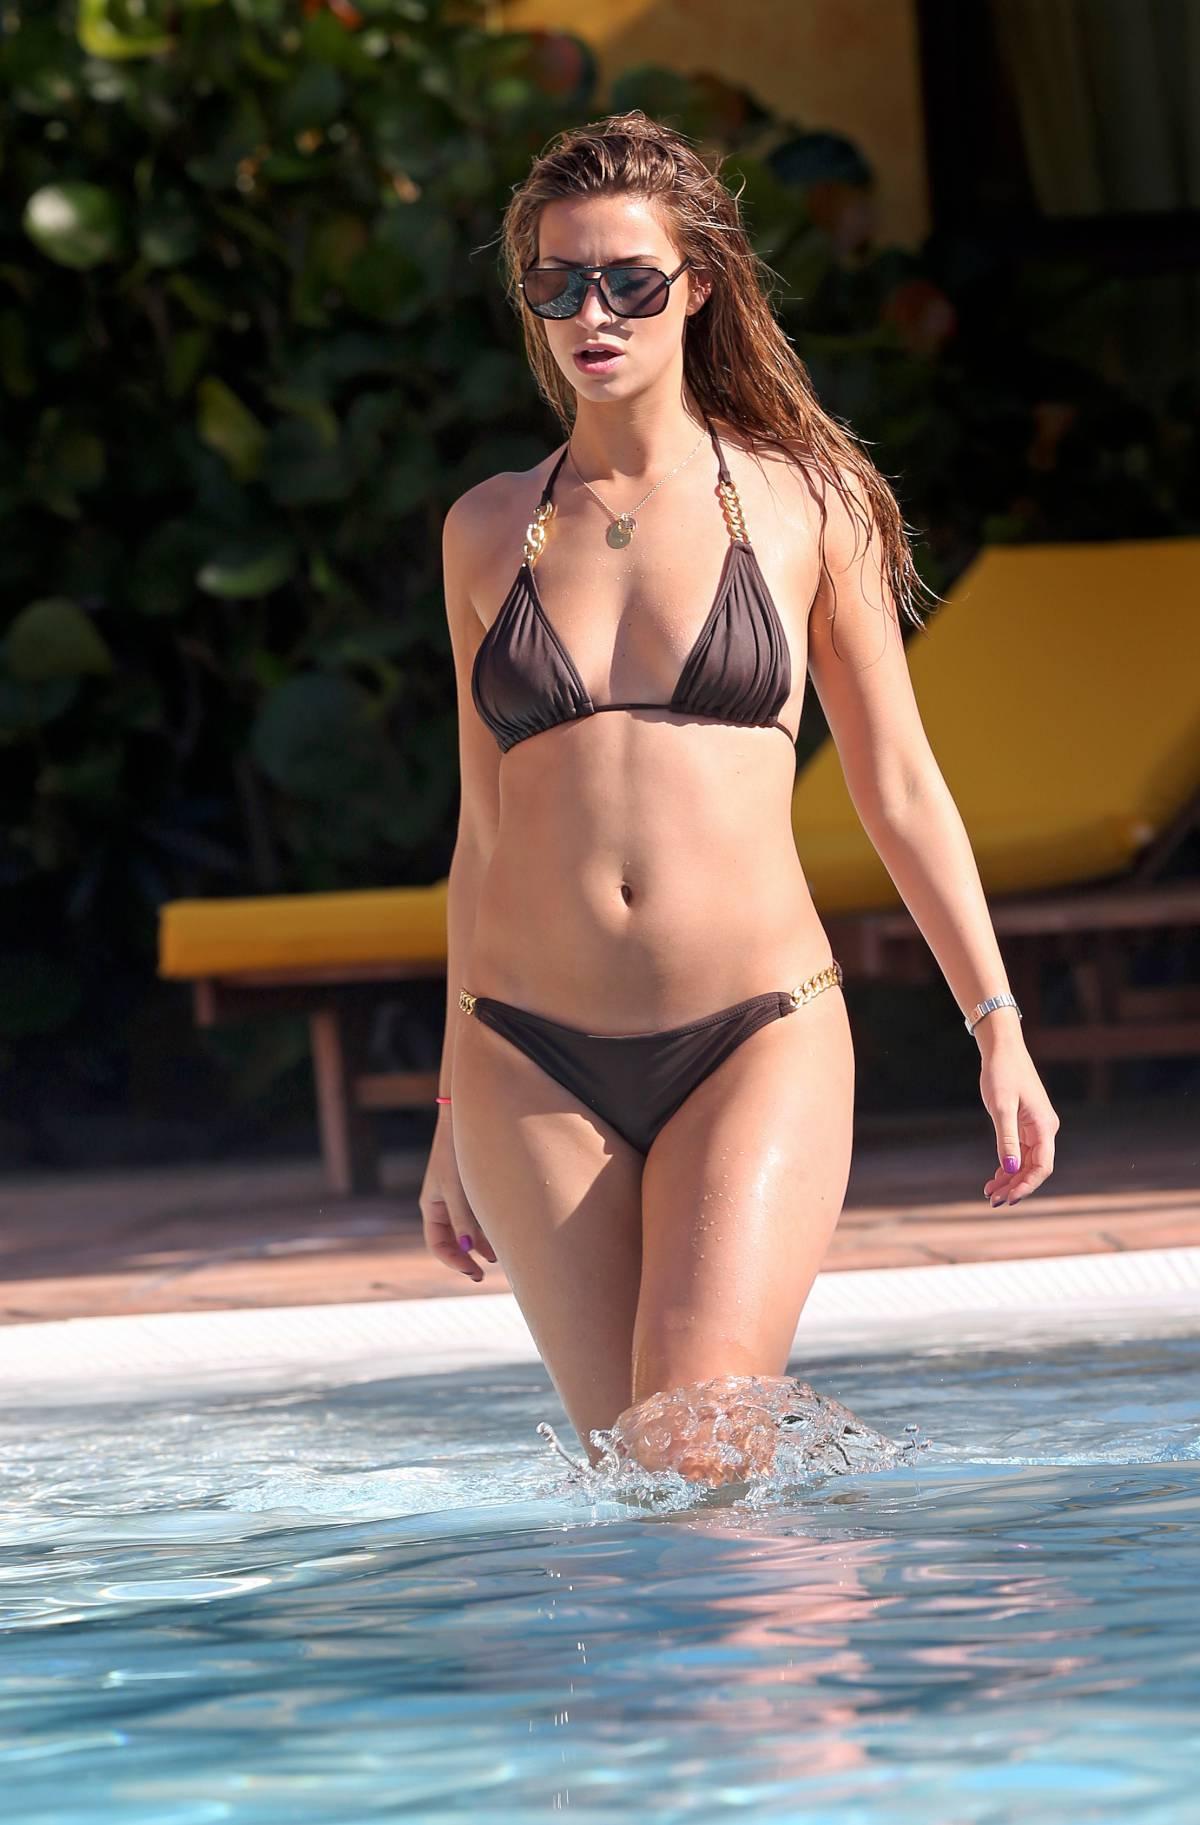 Full Body Girl Wallpaper Ferne Mccann Bikini Photos 2014 In Tenerife 20 Gotceleb